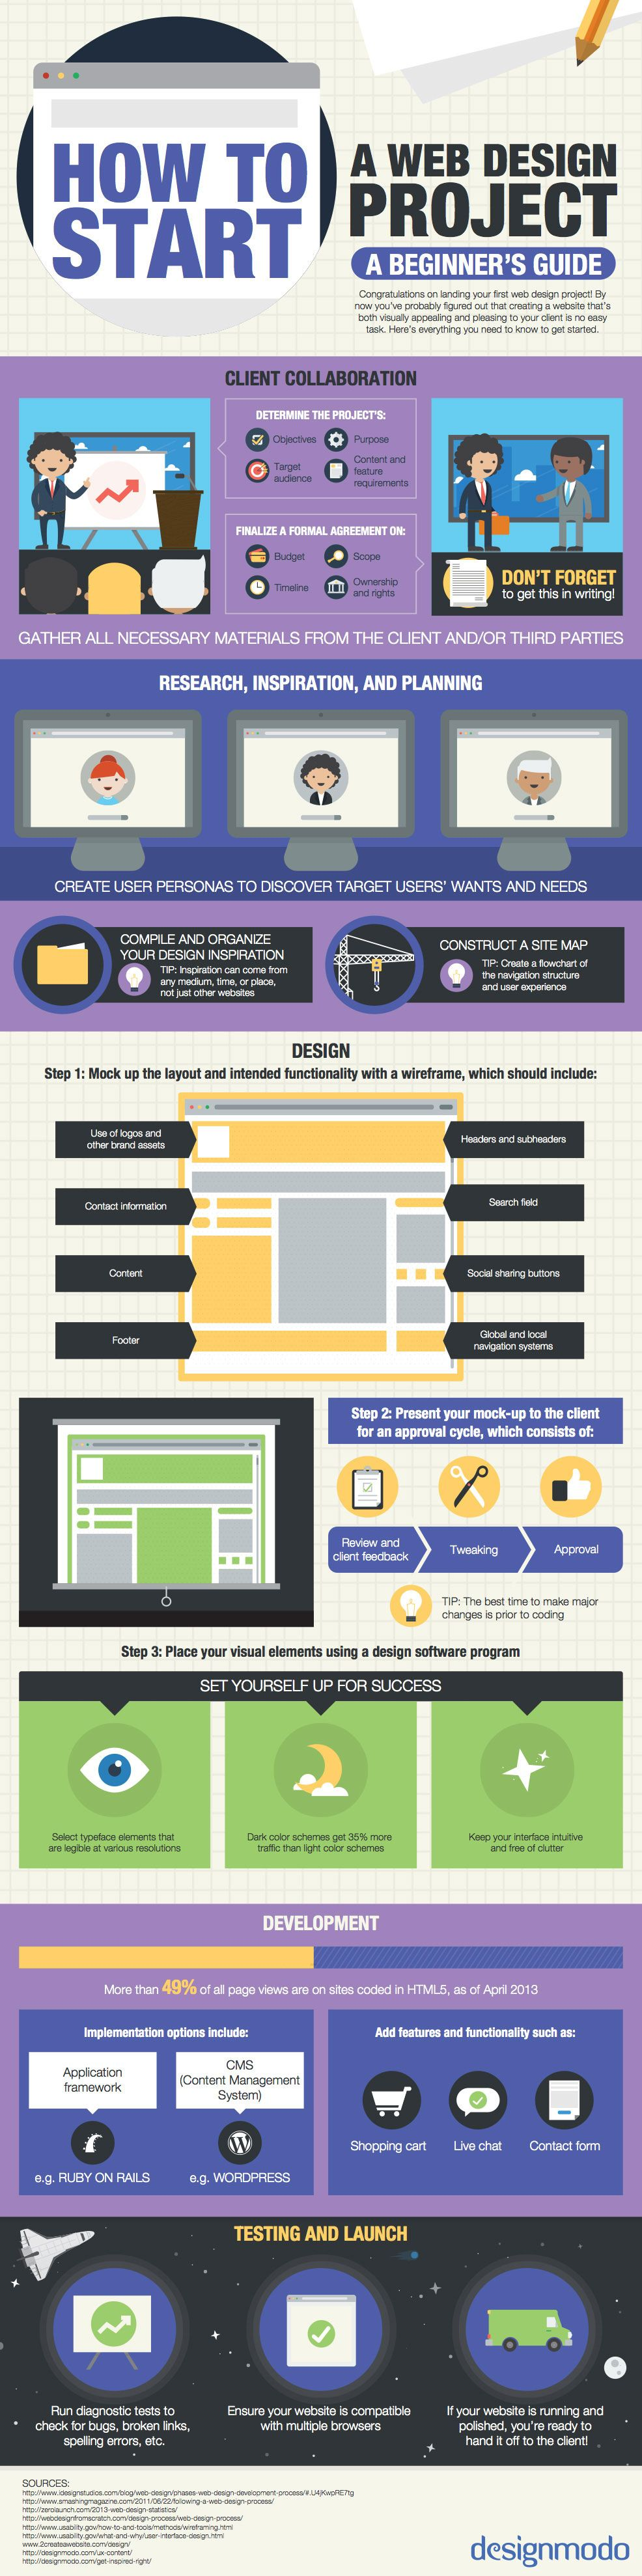 [Infographie] Comment lancer un projet de webdesign? || [Infographic] How To: Start a Web Design Project #webdesign #digital #design